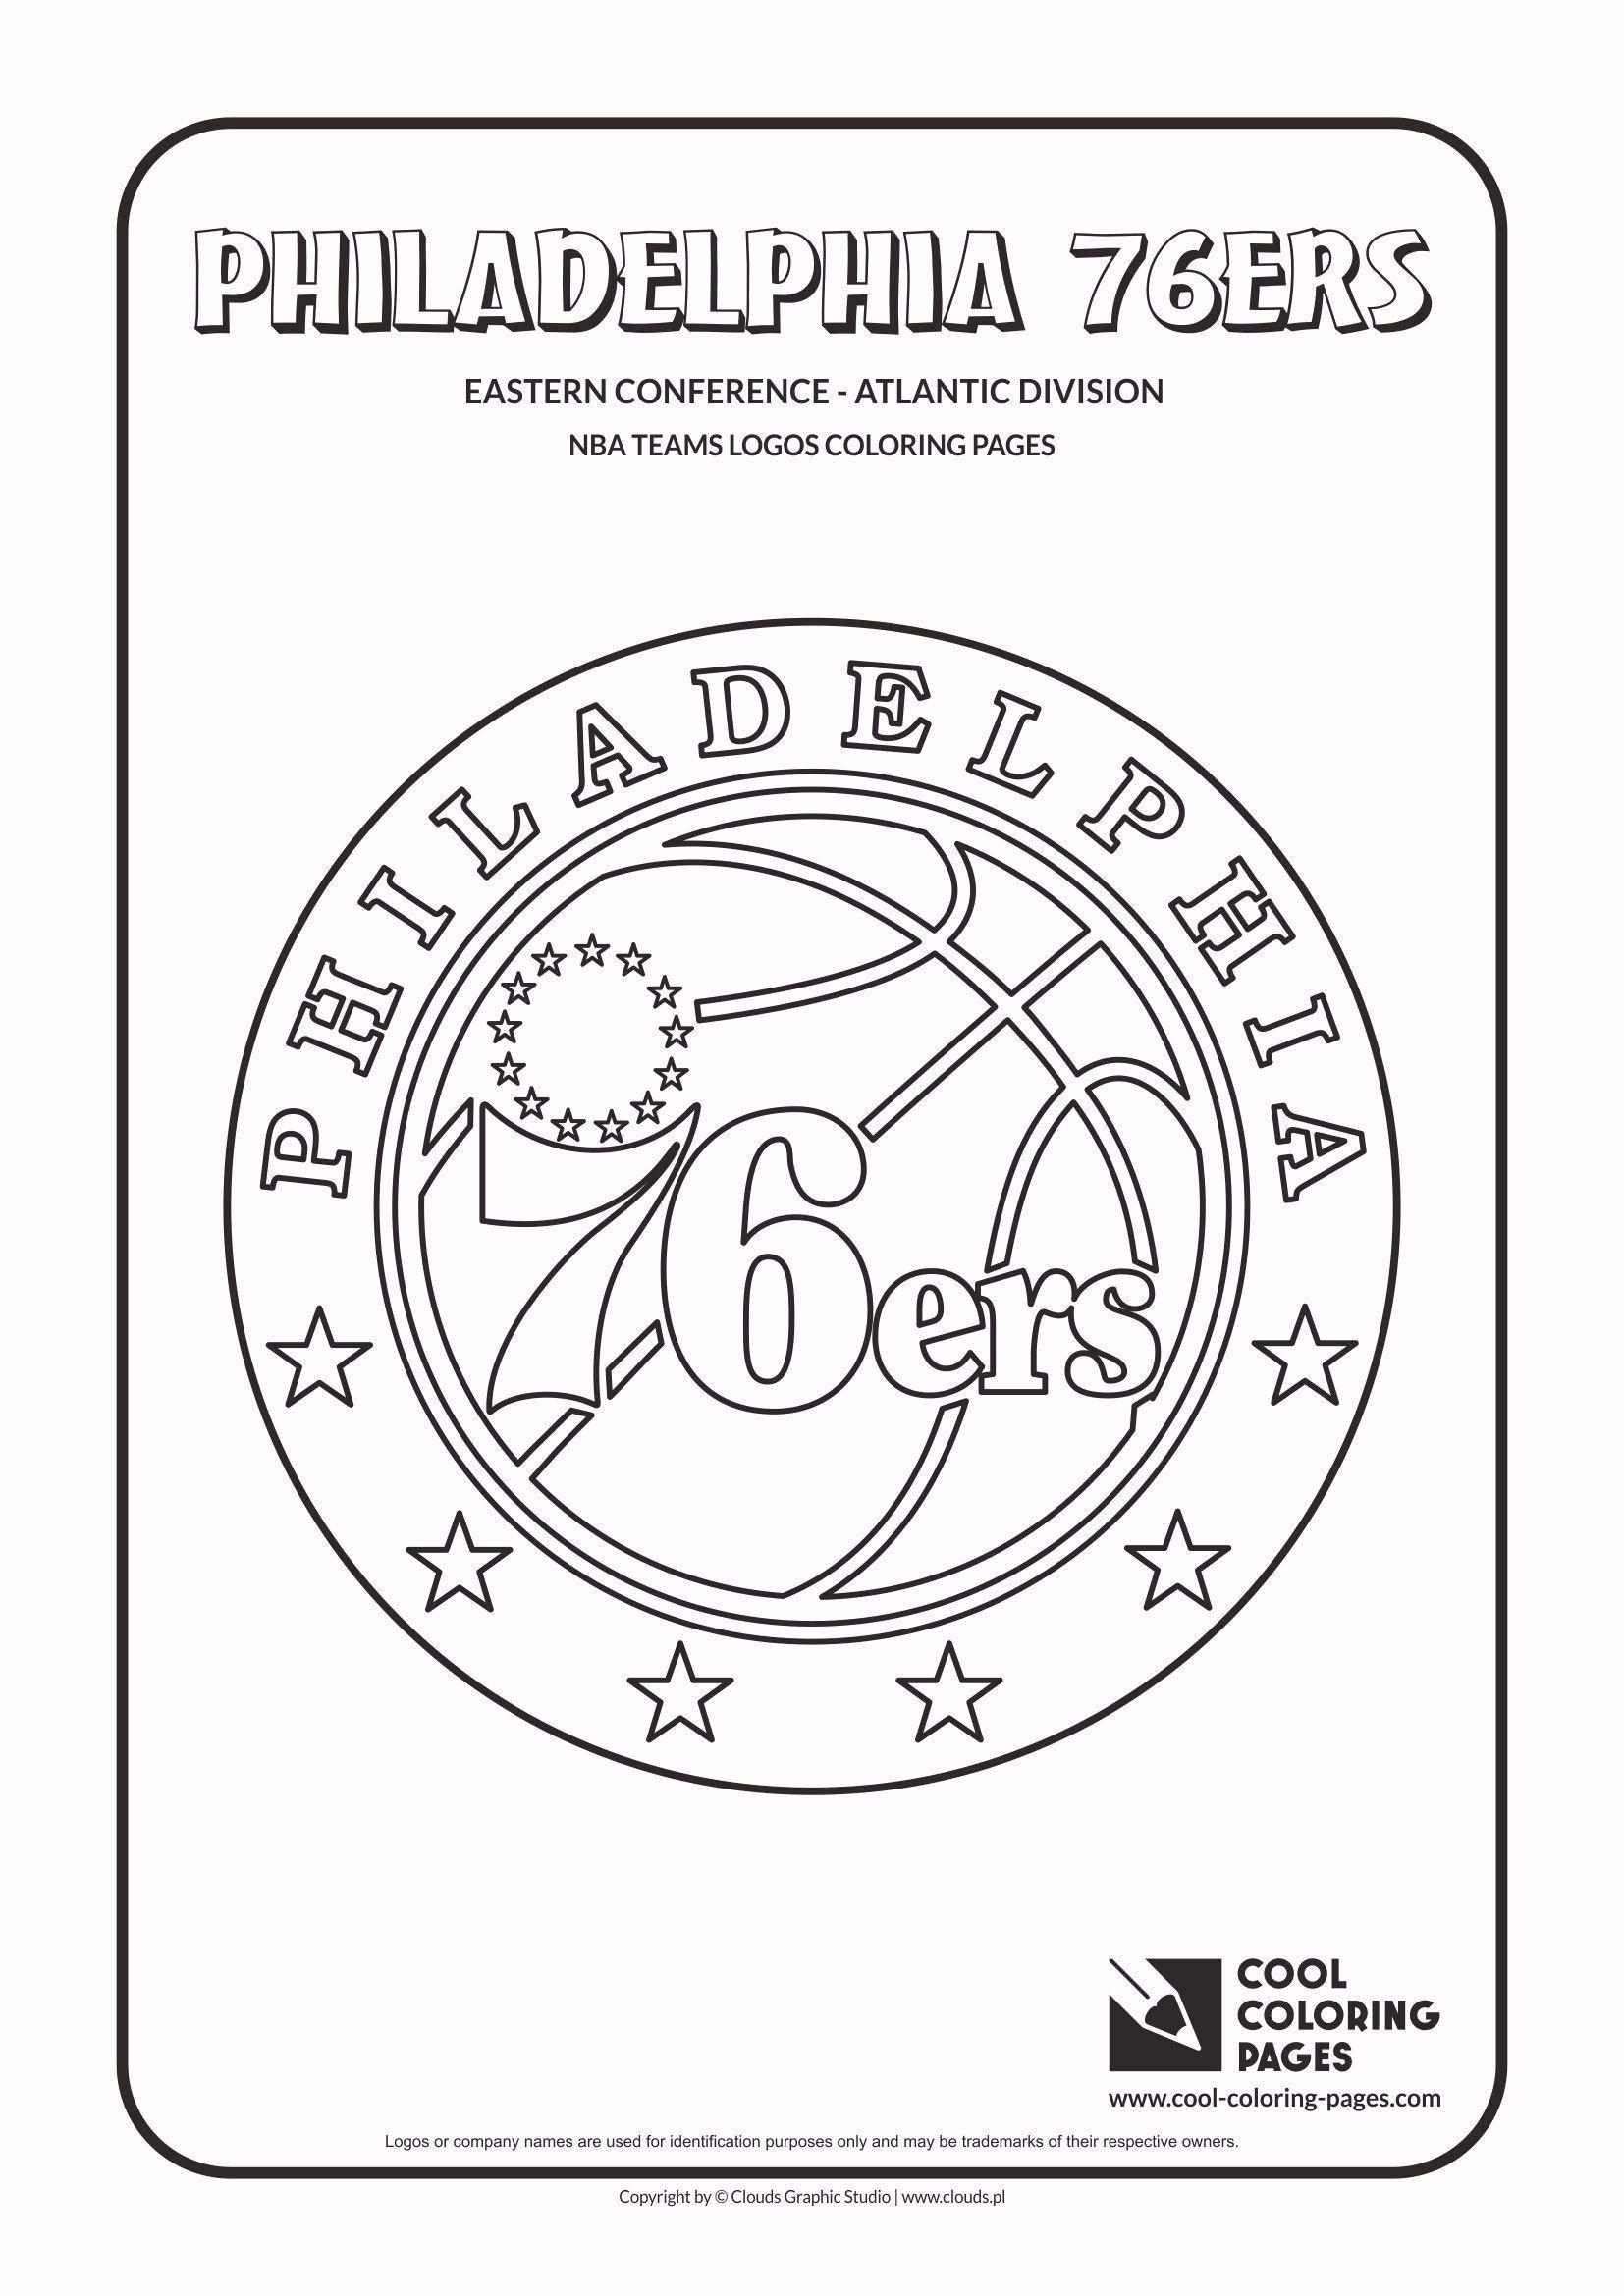 Cool Coloring Pages Nba Teams Logos Philadelphia 76ers Logo Coloring Page In 2020 Philadelphia 76ers Nba Basketball Teams Cool Coloring Pages